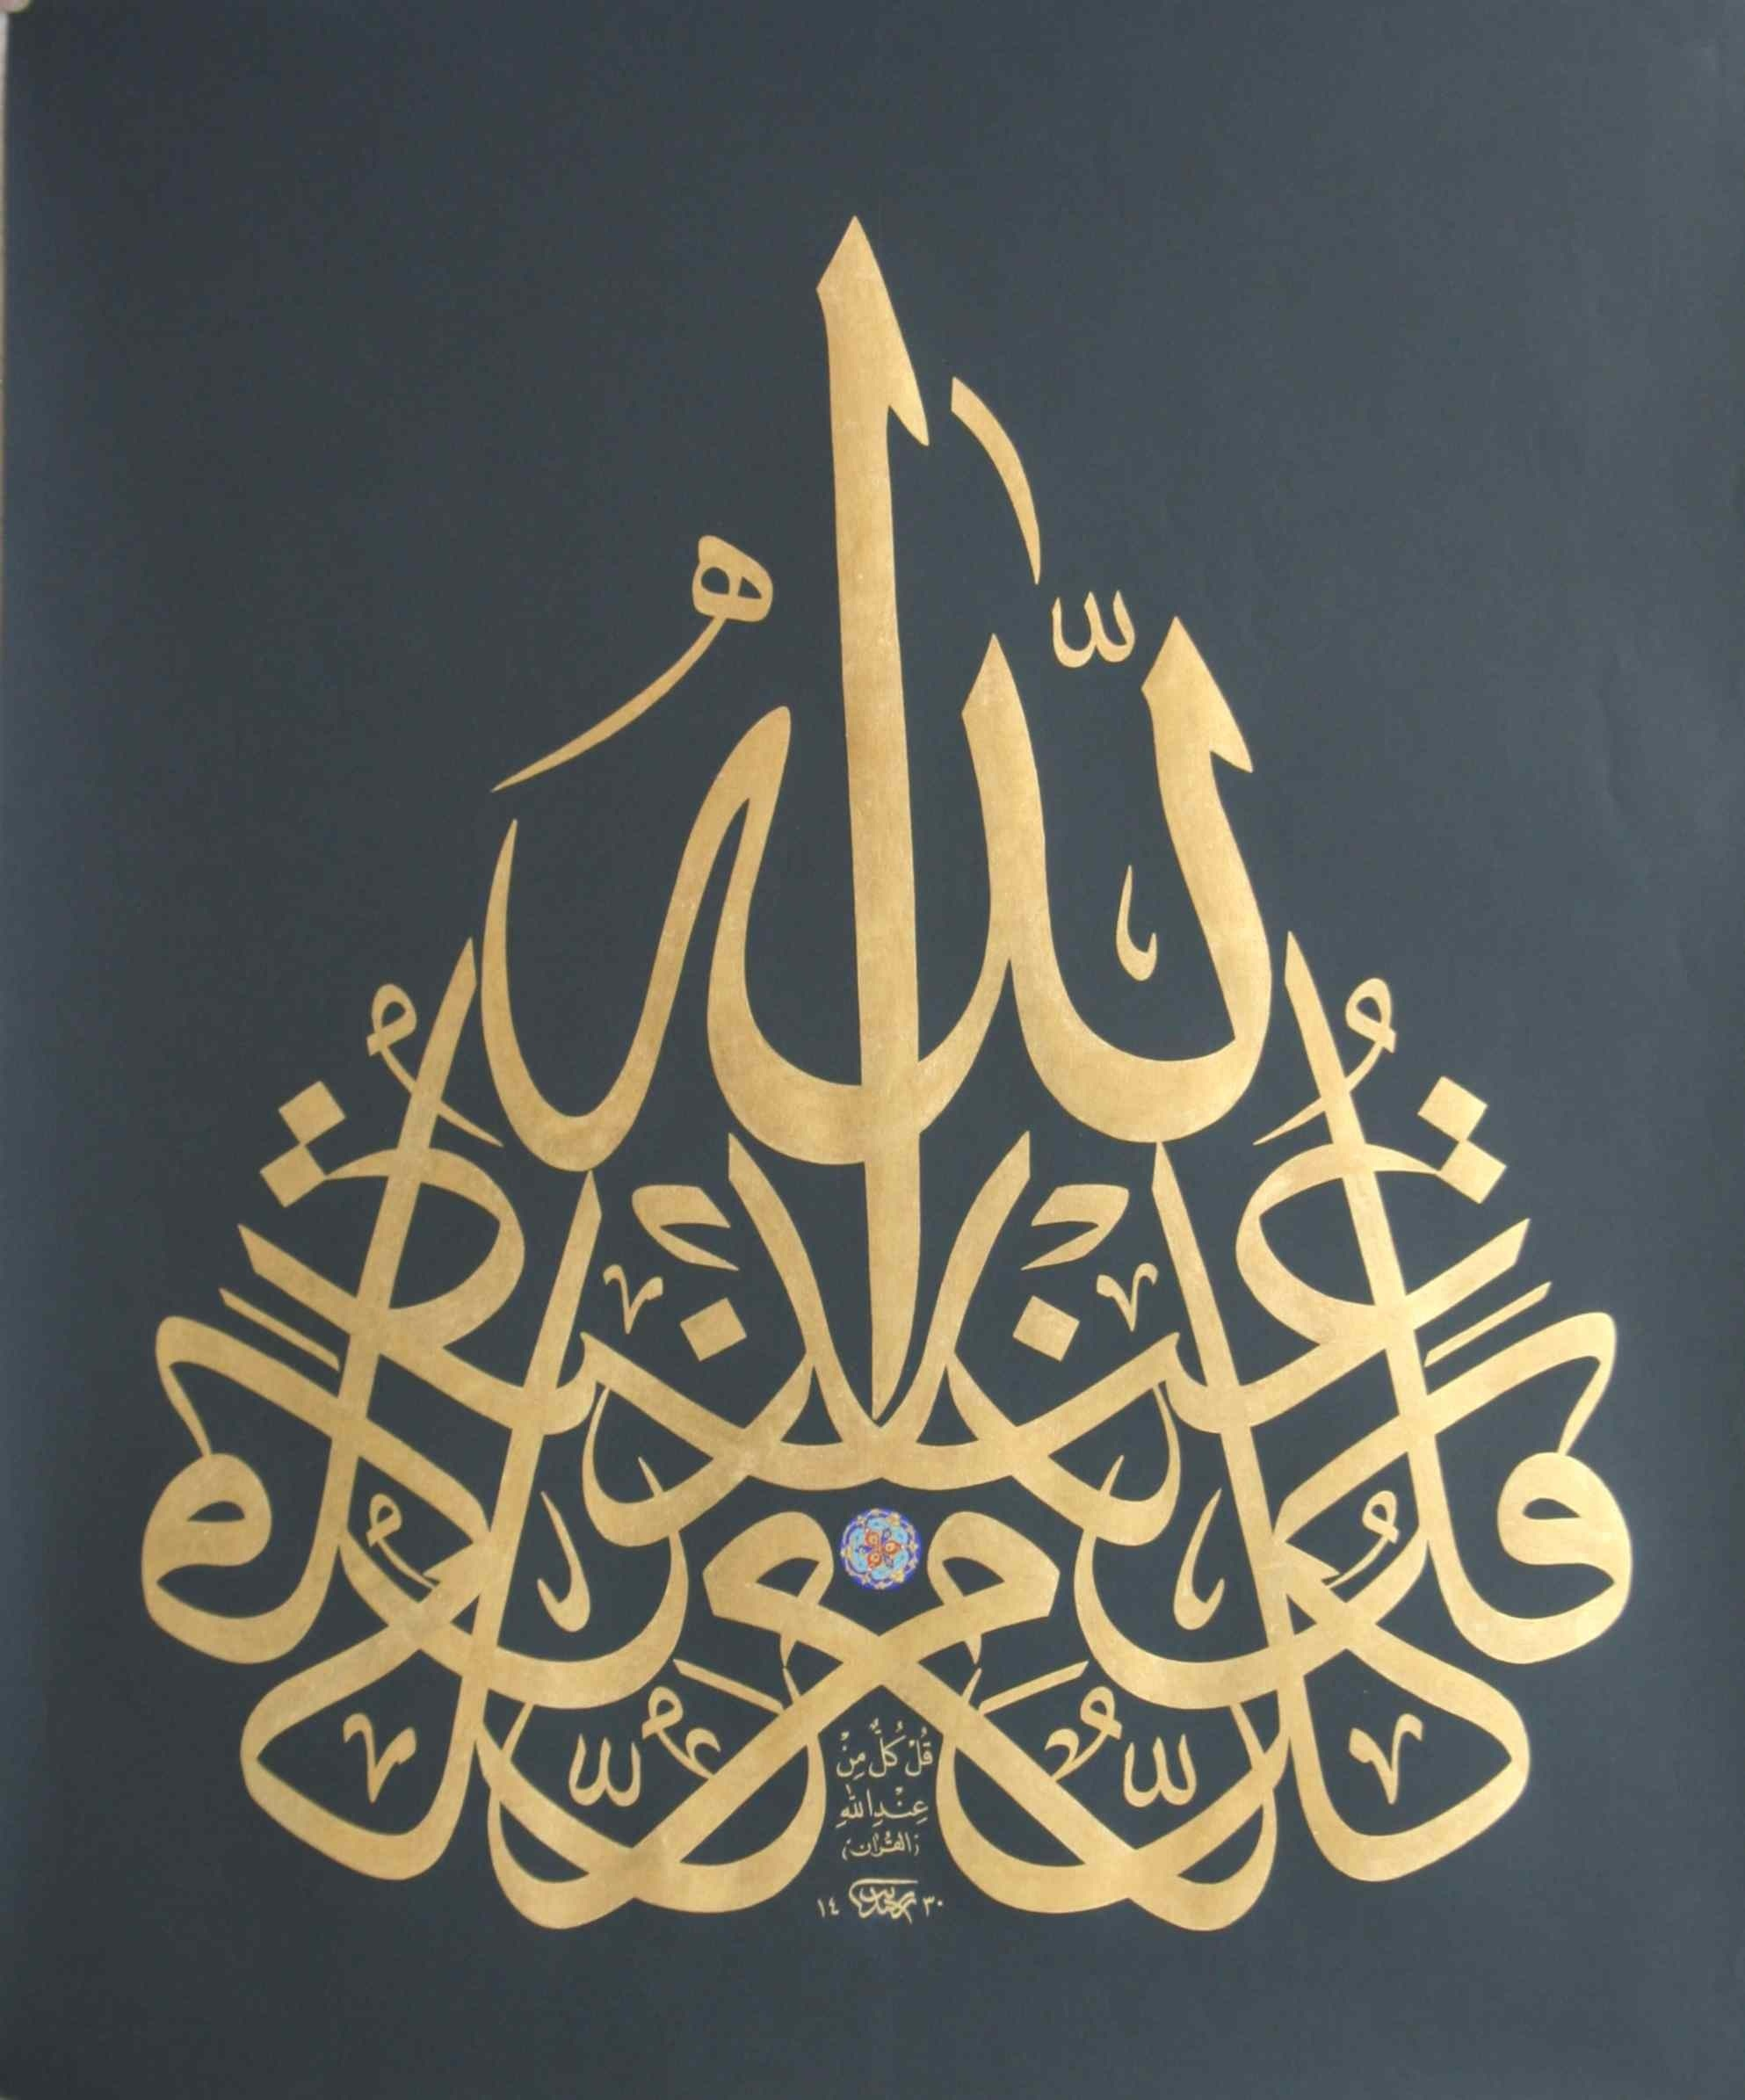 Quranic Ayat By Asad5565 On DeviantArt